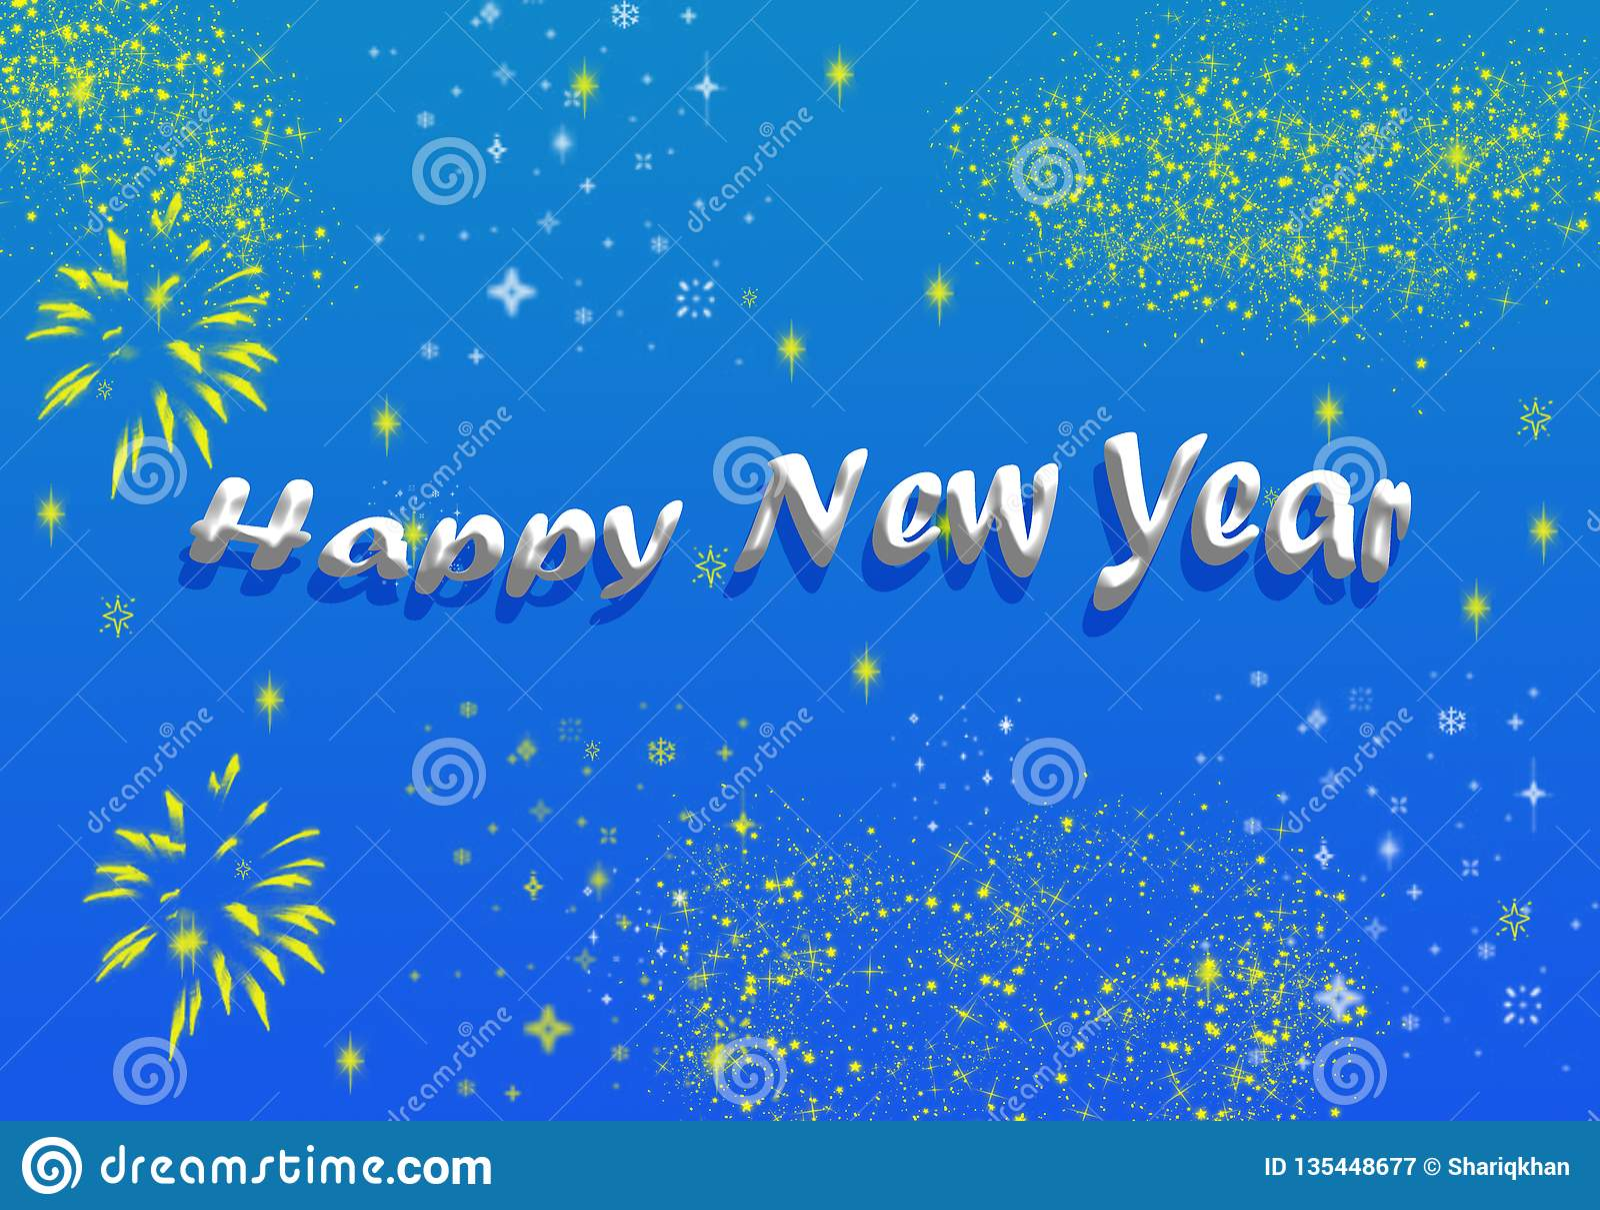 Happy New Year Greeting Shining Stars Glittering